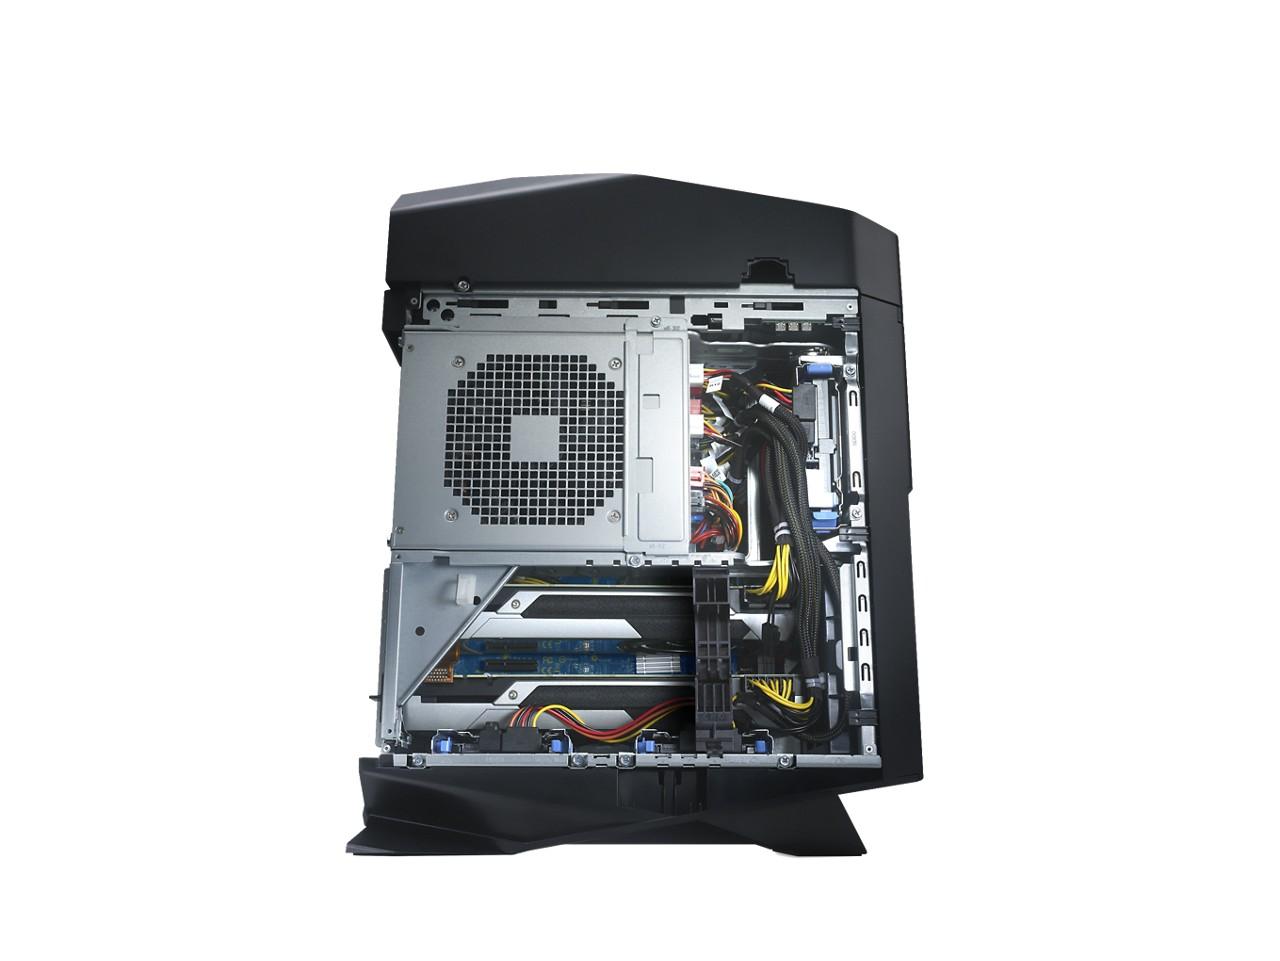 Alienware Aurora R8 Gaming Desktop Intel i5 9400 NVIDIA GTX 1660 128GB SSD  + 1TB HDD 16GB RAM